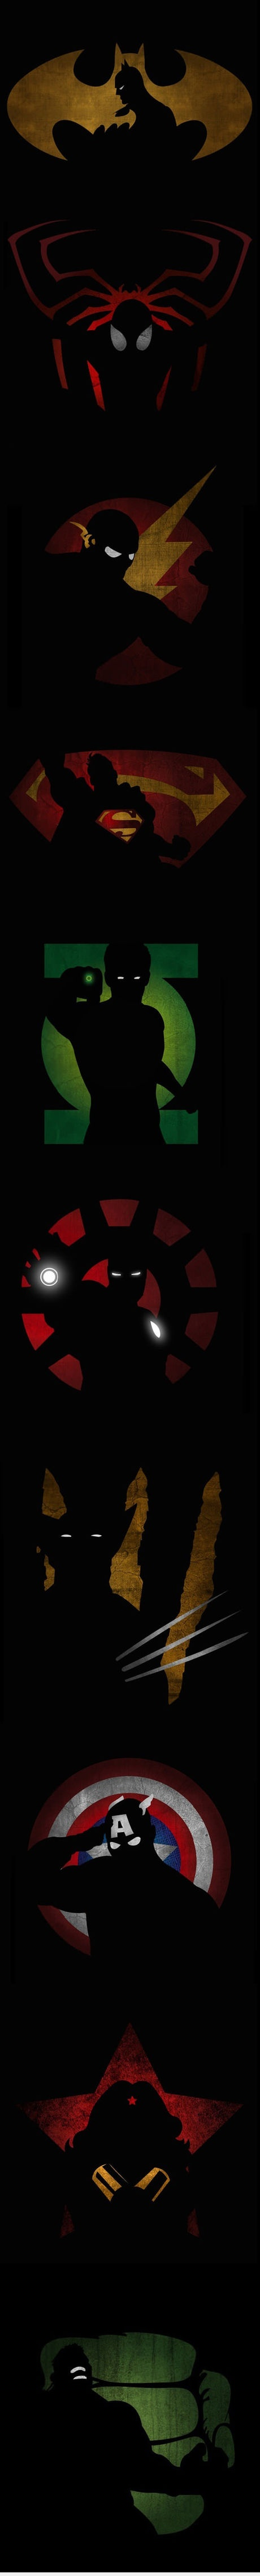 One hero, two shadows